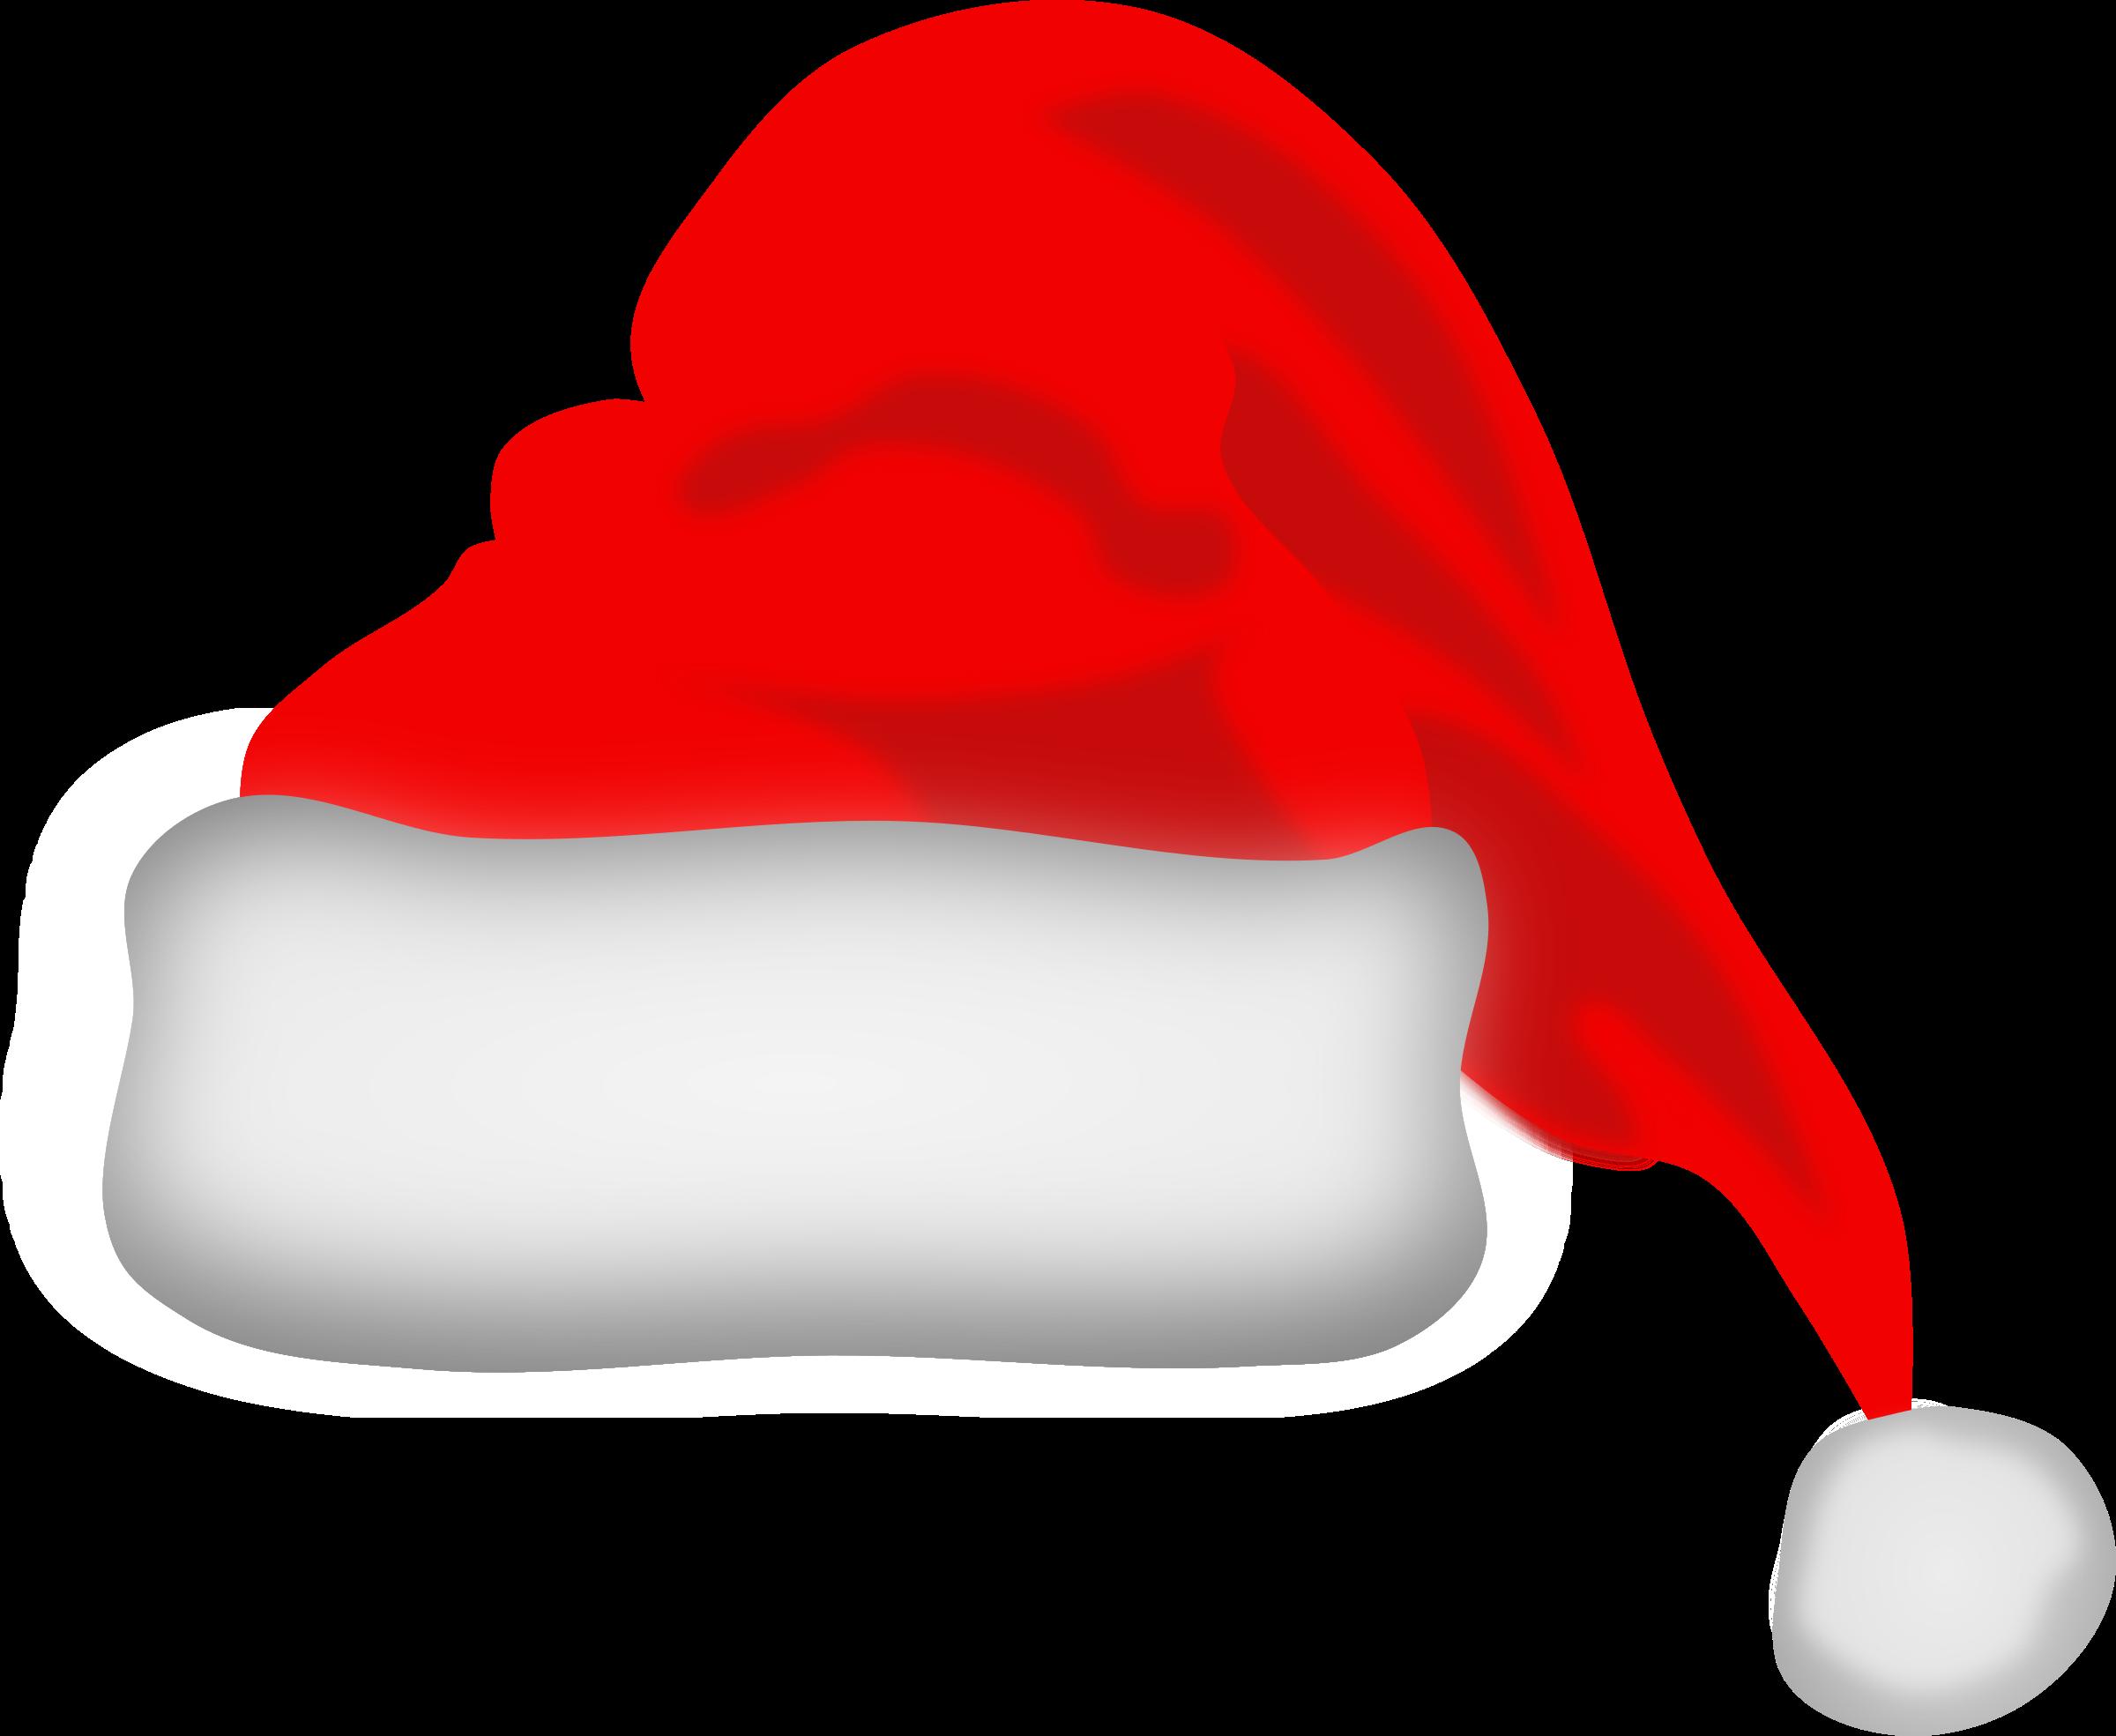 Download Svg Black And White Santa Beard No Background Clipart Santa Claus Hat Transparent Background Png Image With No Background Pngkey Com